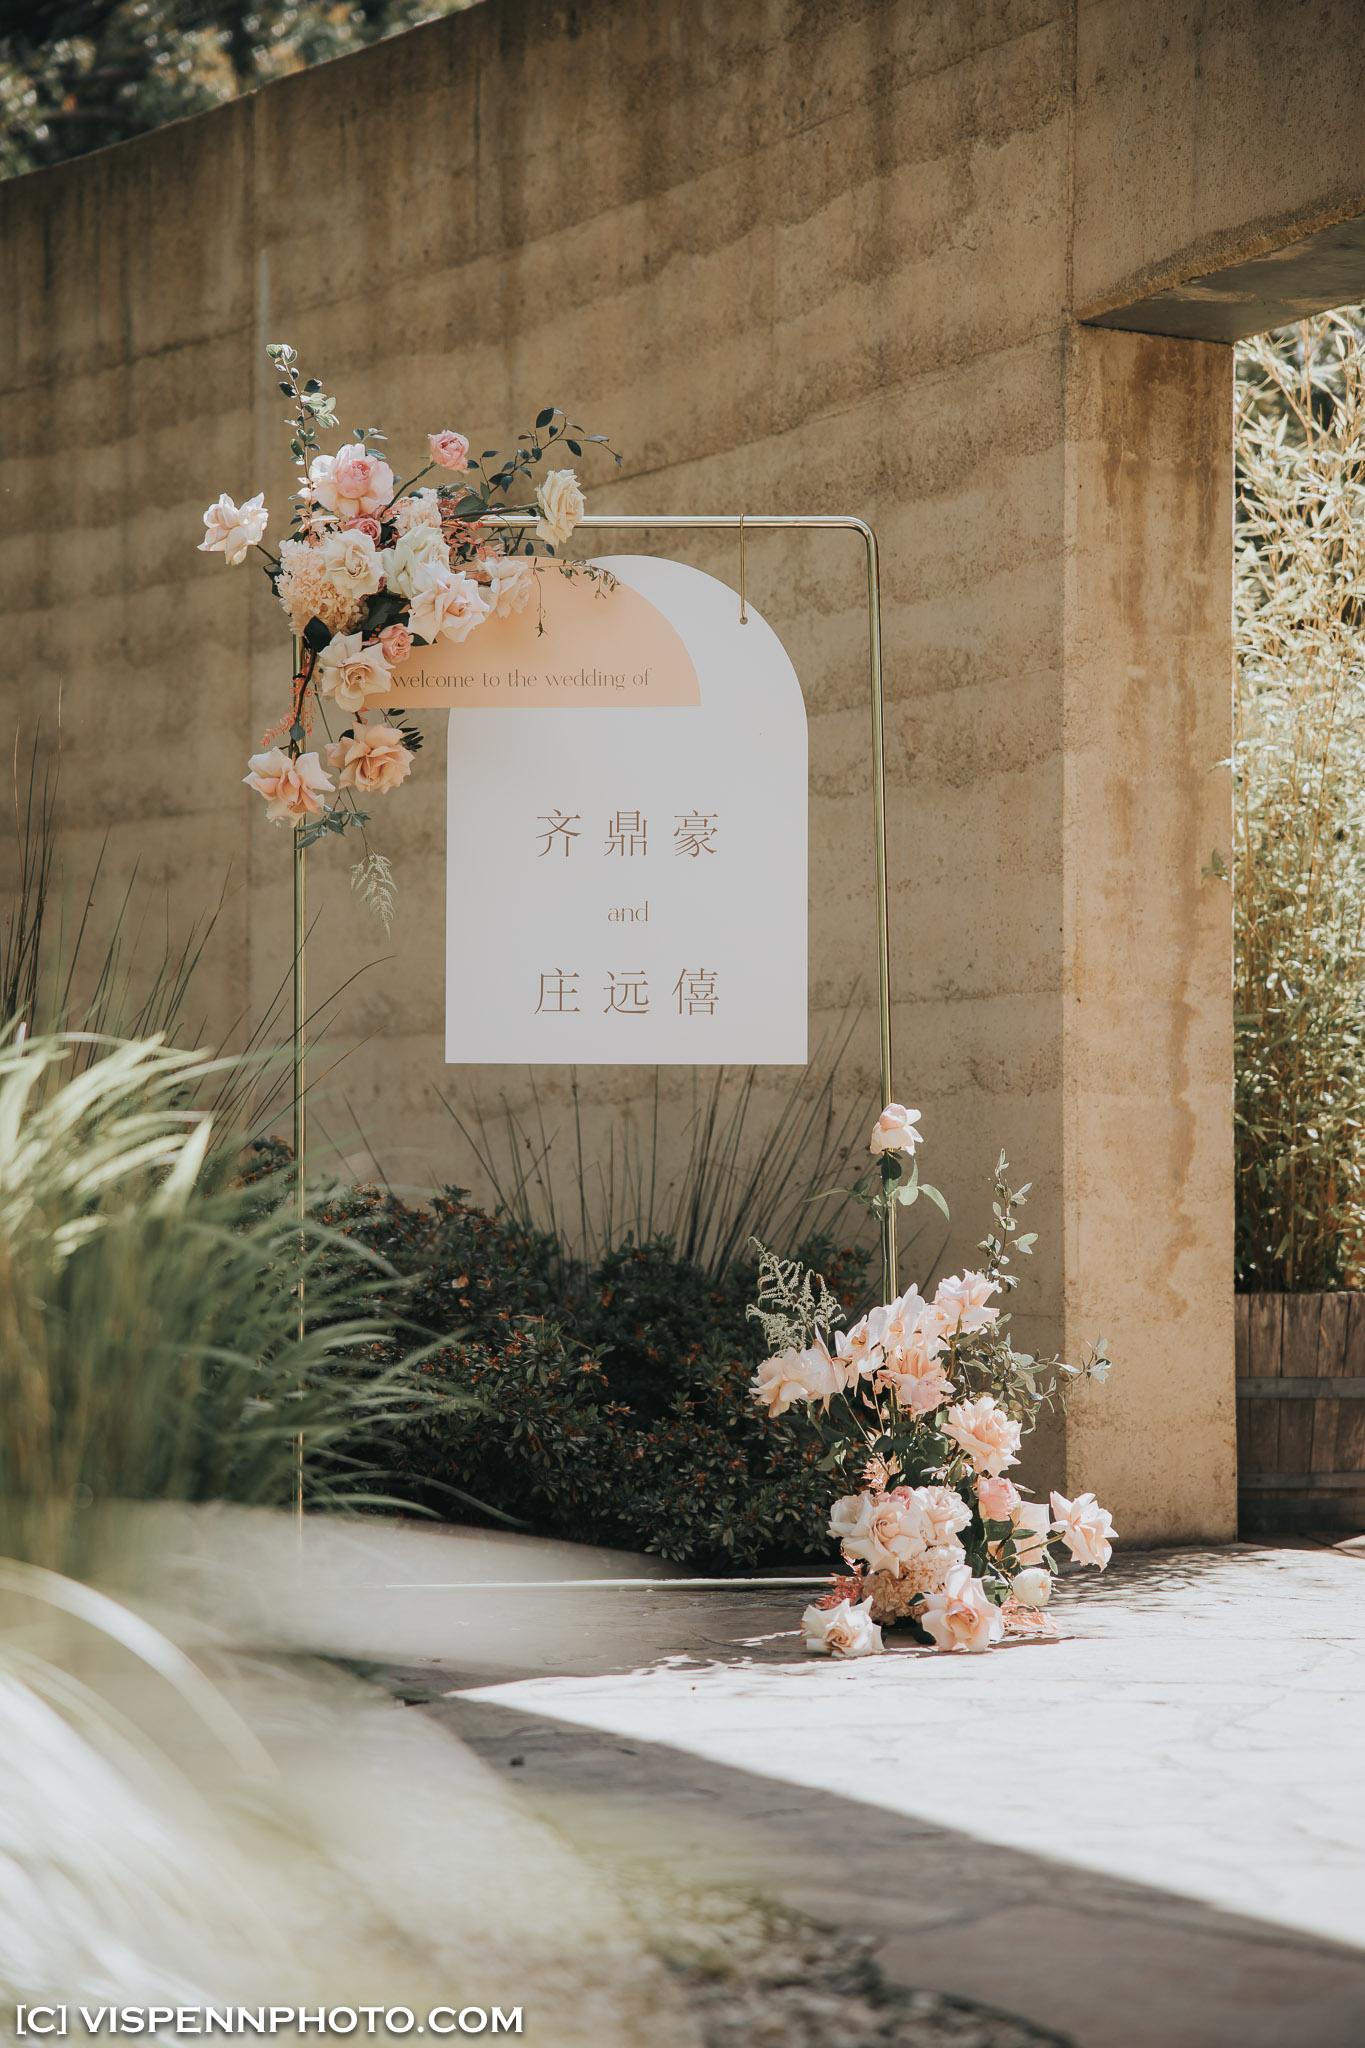 WEDDING DAY Photography Melbourne VISPENN 墨尔本 婚礼跟拍 婚礼摄像 婚礼摄影 结婚照 登记照 ElitaPB 07282 1P EOSR VISPENN